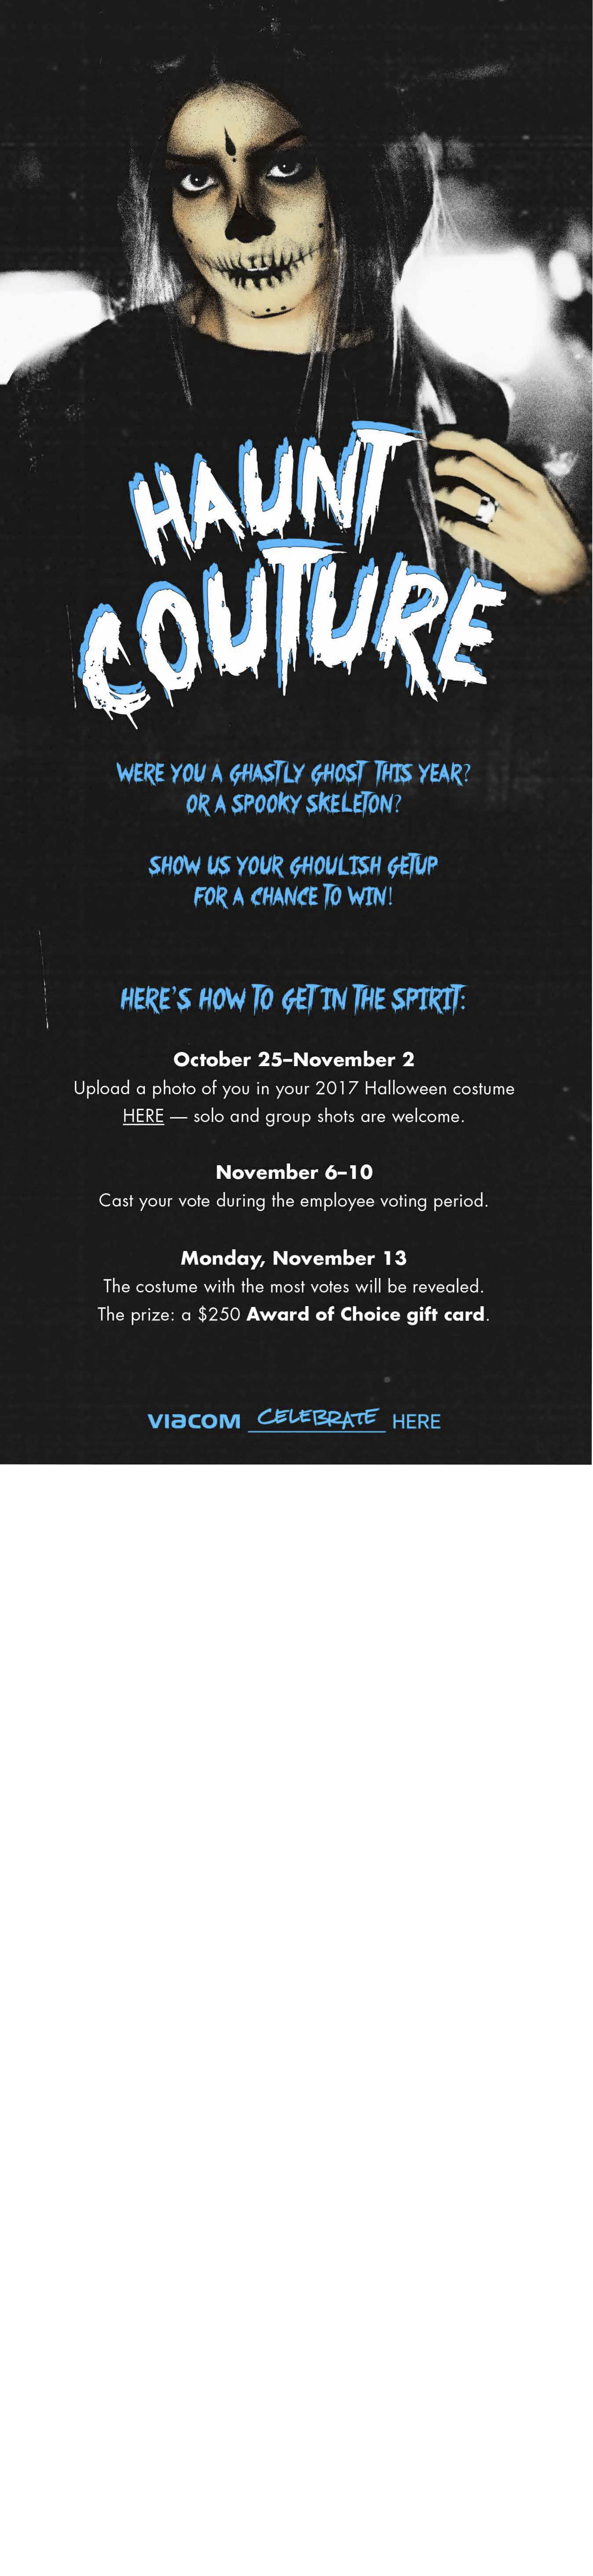 Halloween-Costume-Contest-email.jpg